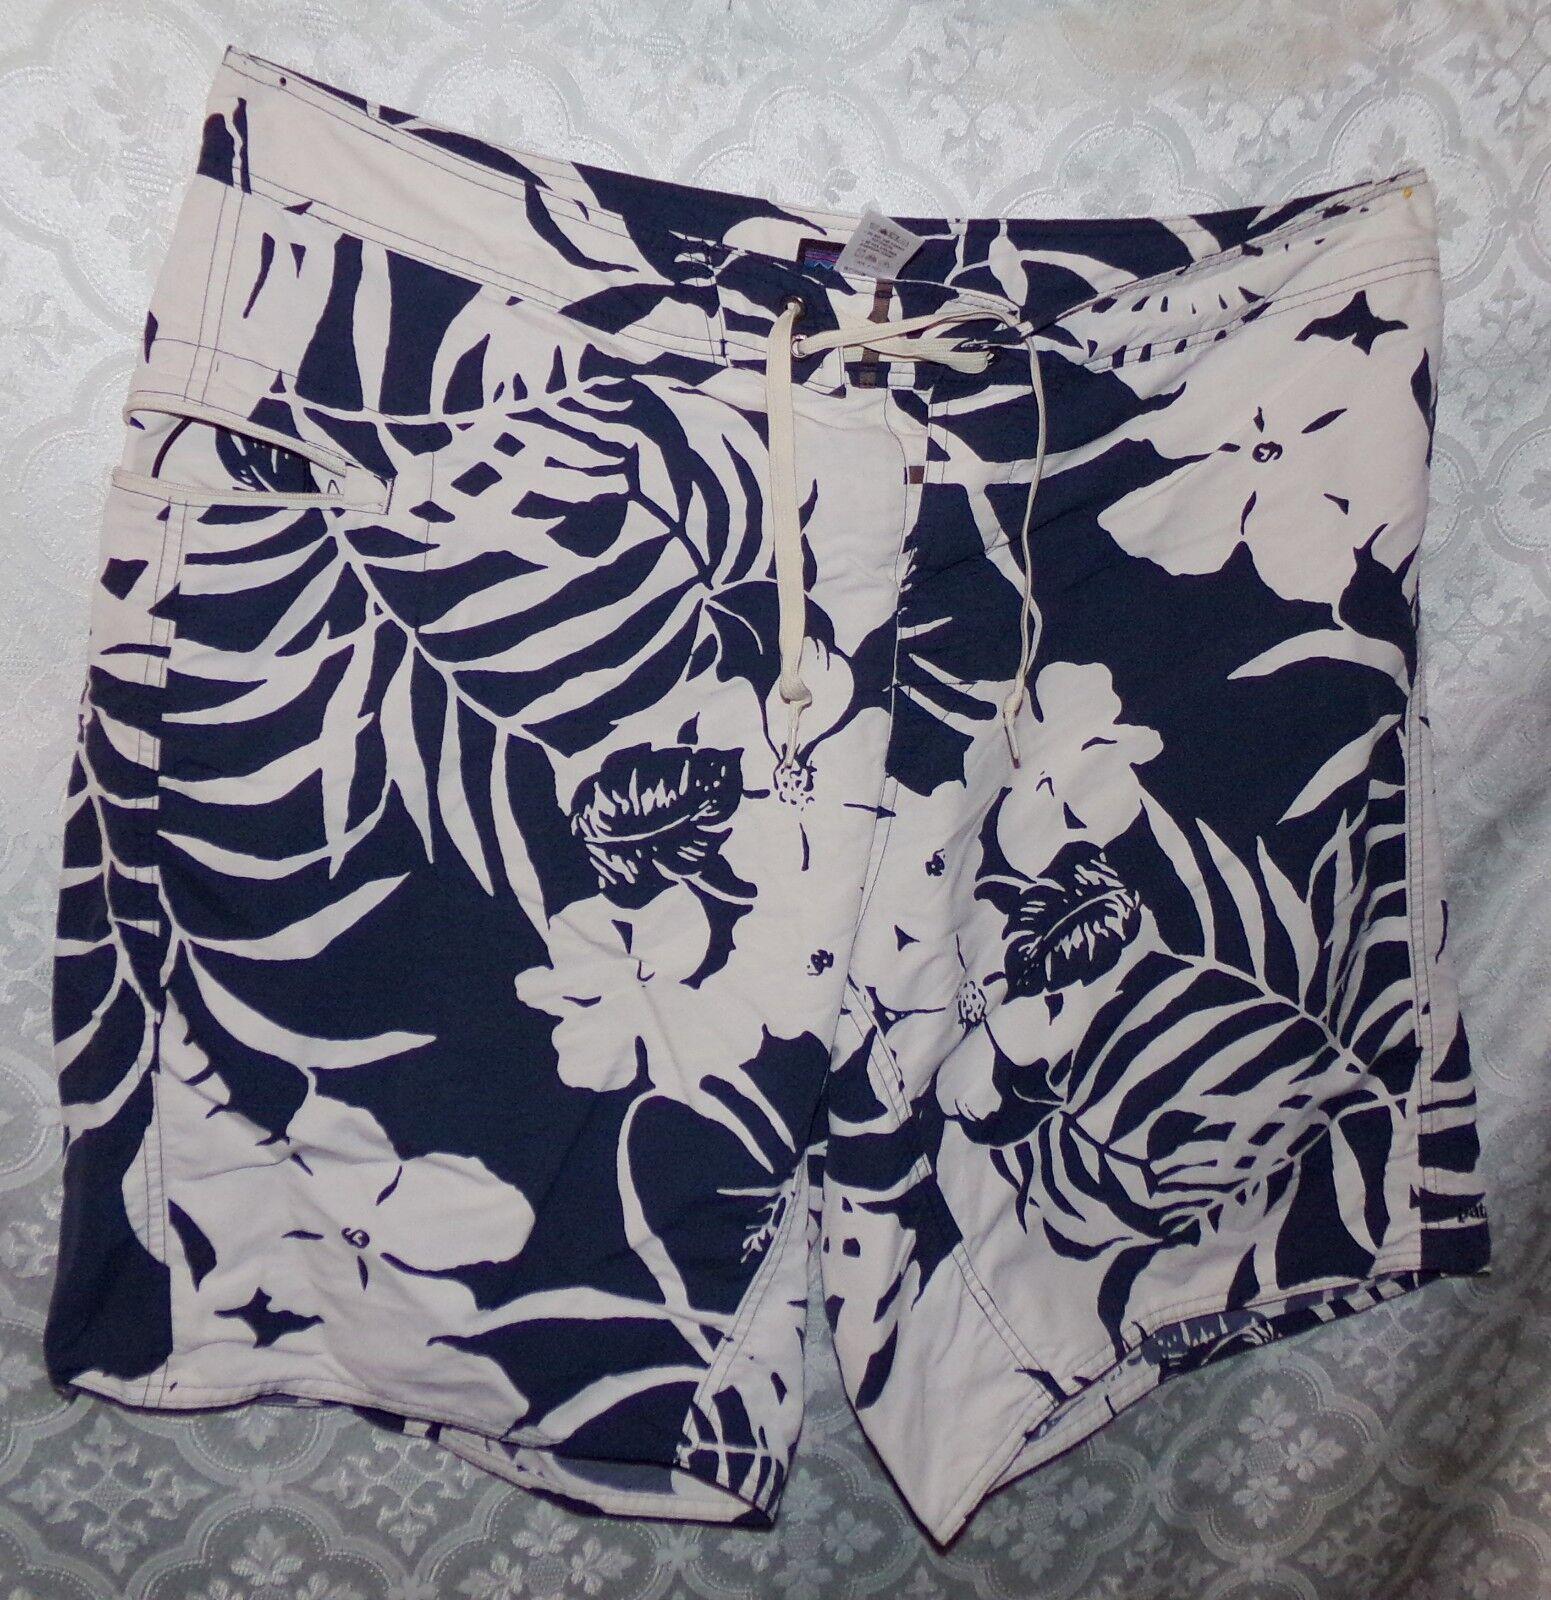 Patagonia Mens Swim Trunks Shorts Board 38 bluee White Floral Print